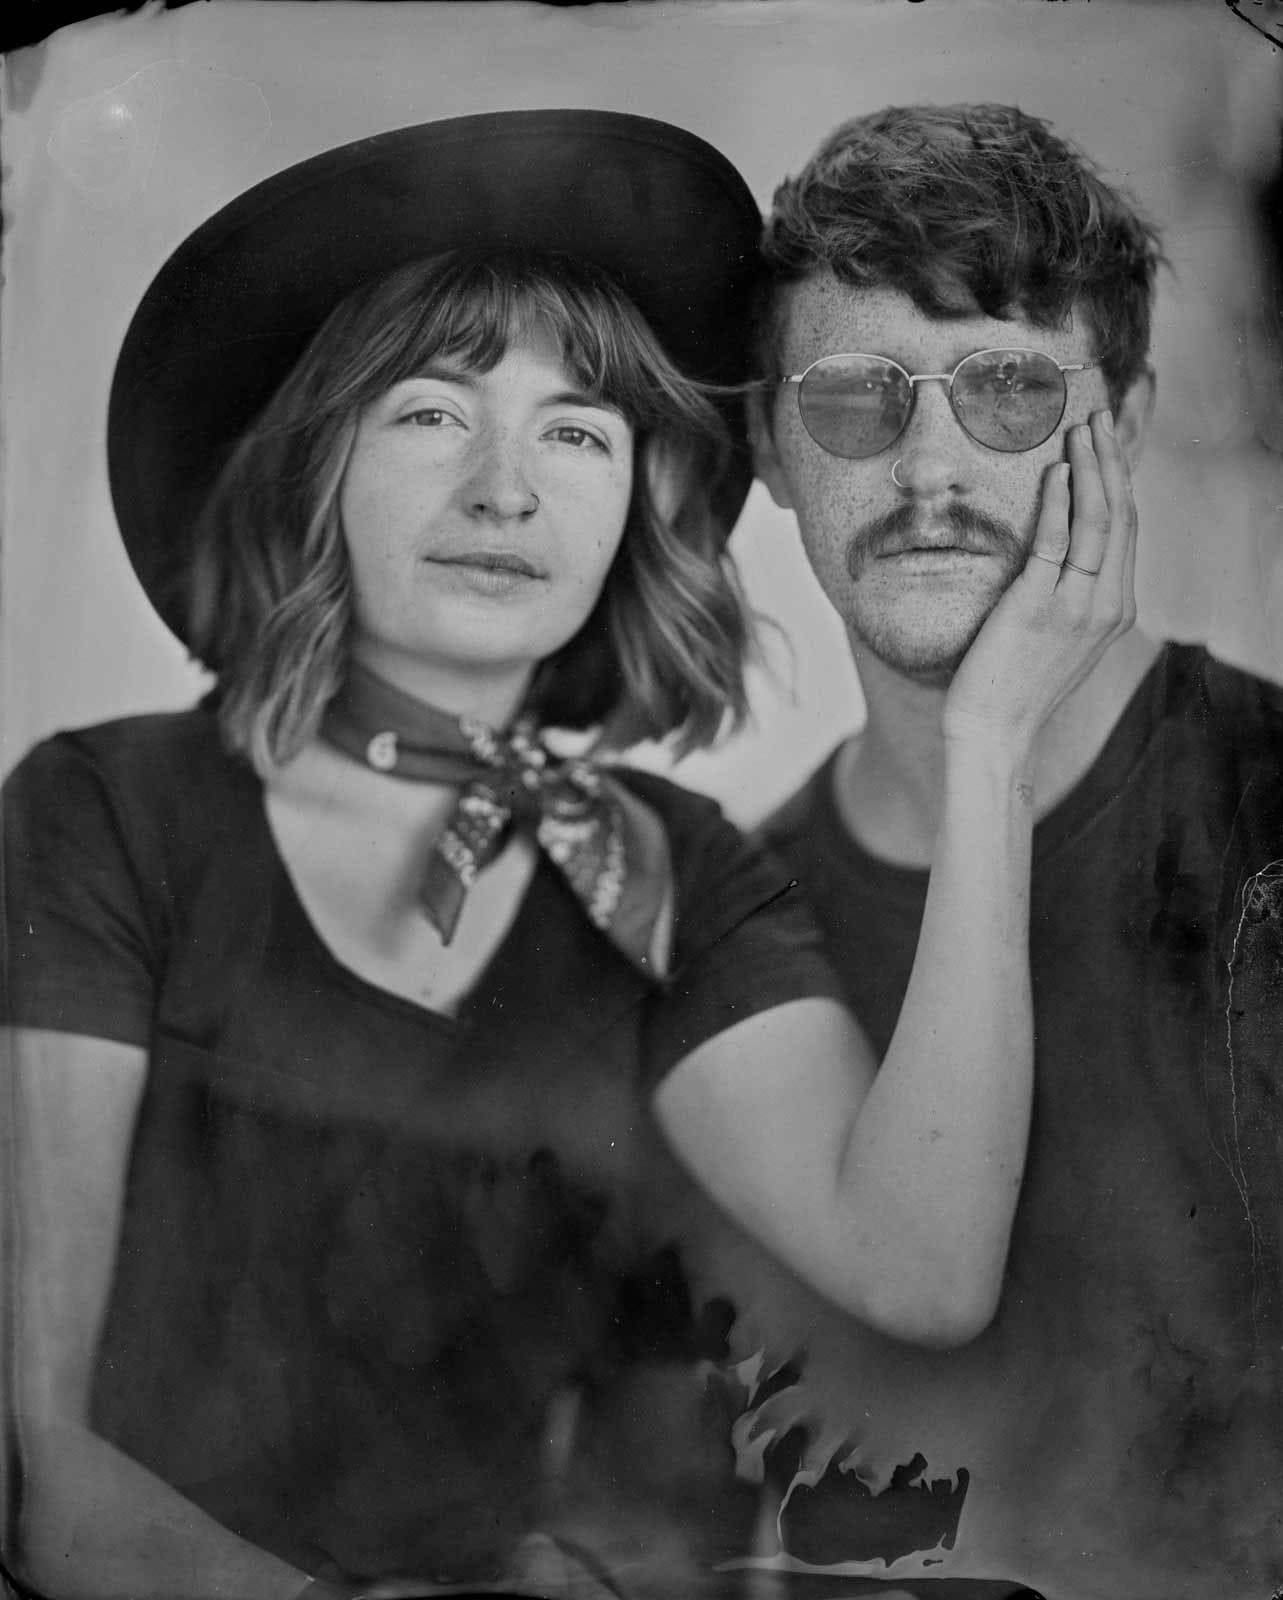 Tintype photography pop-up